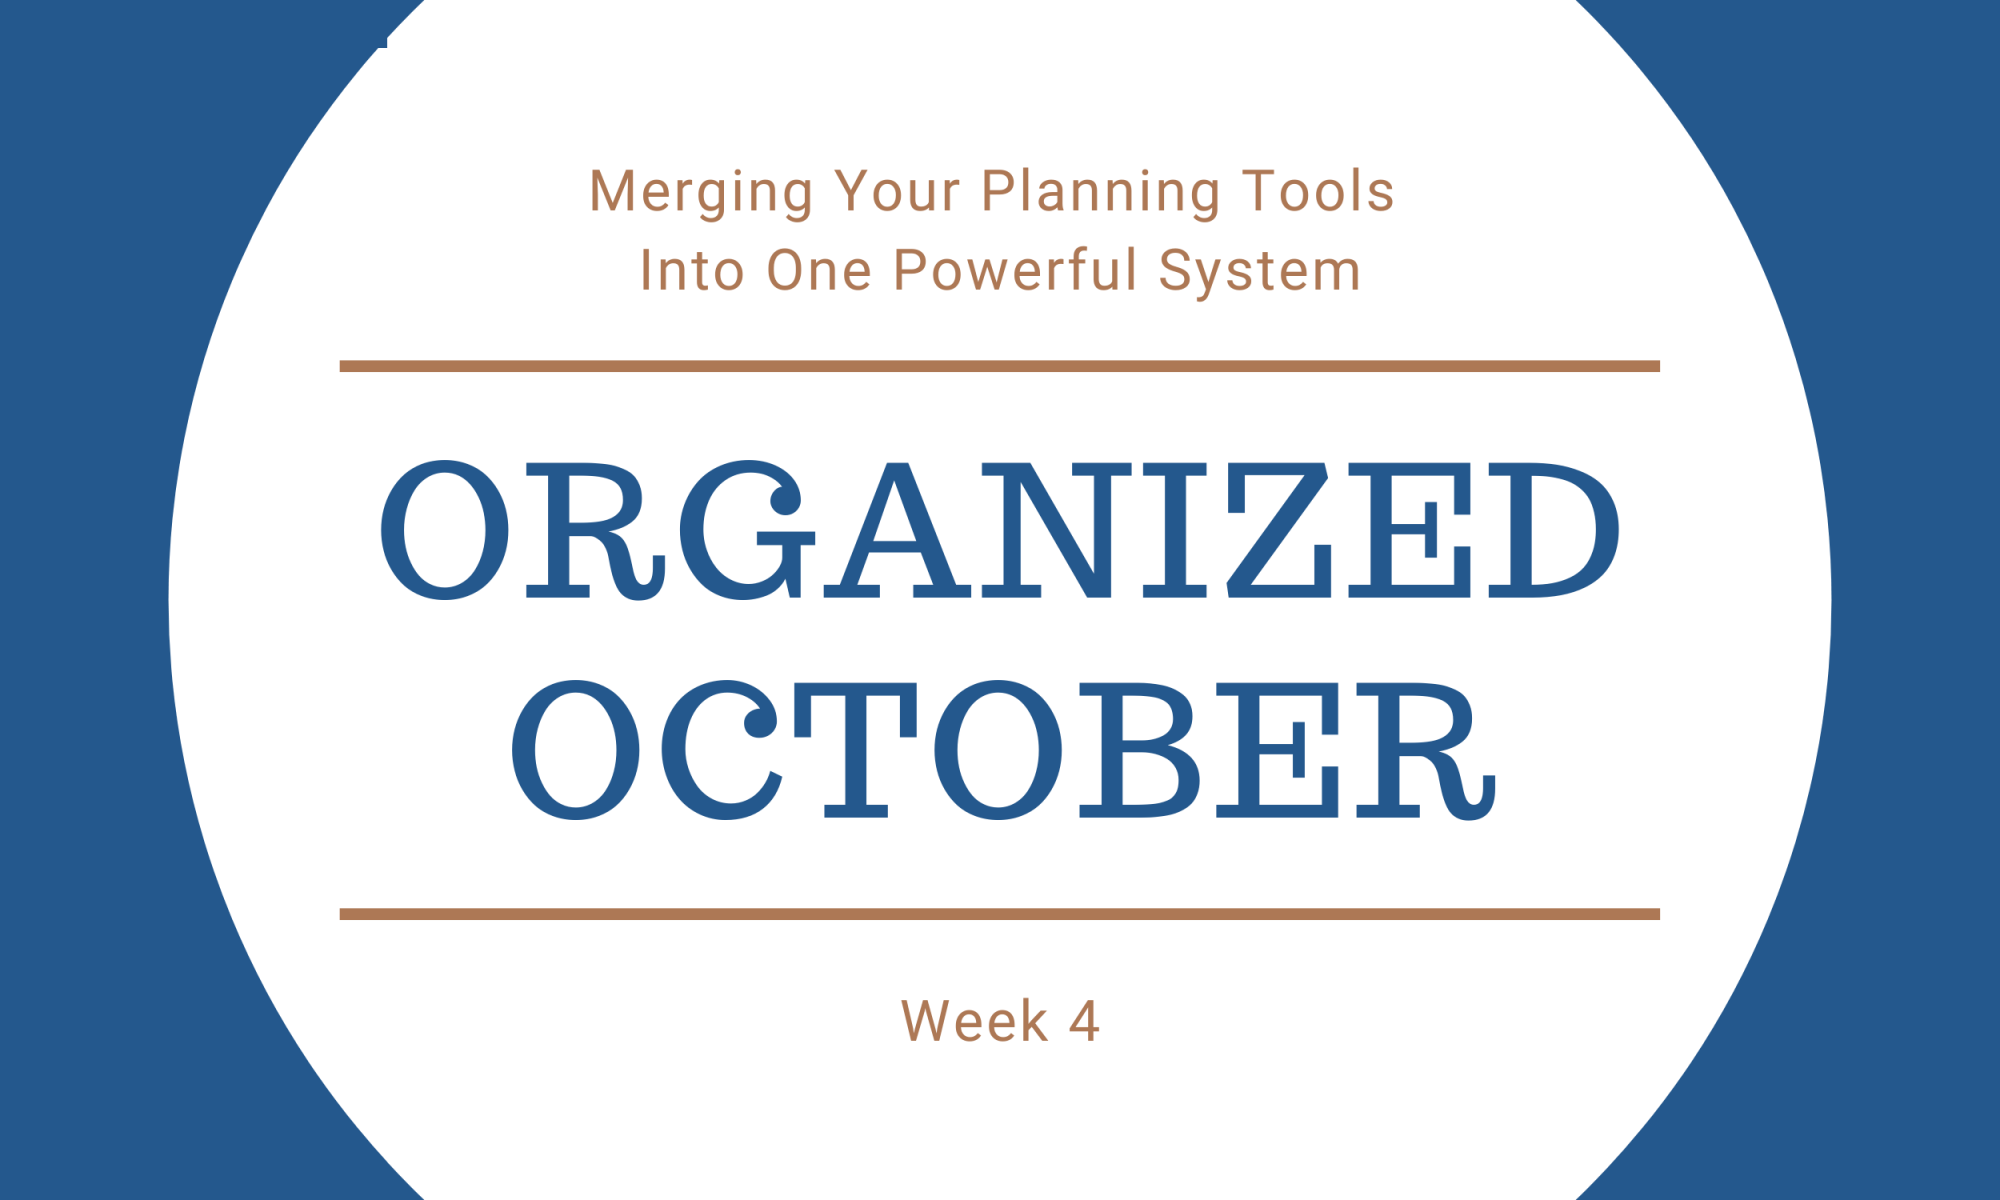 Organized October Week 4